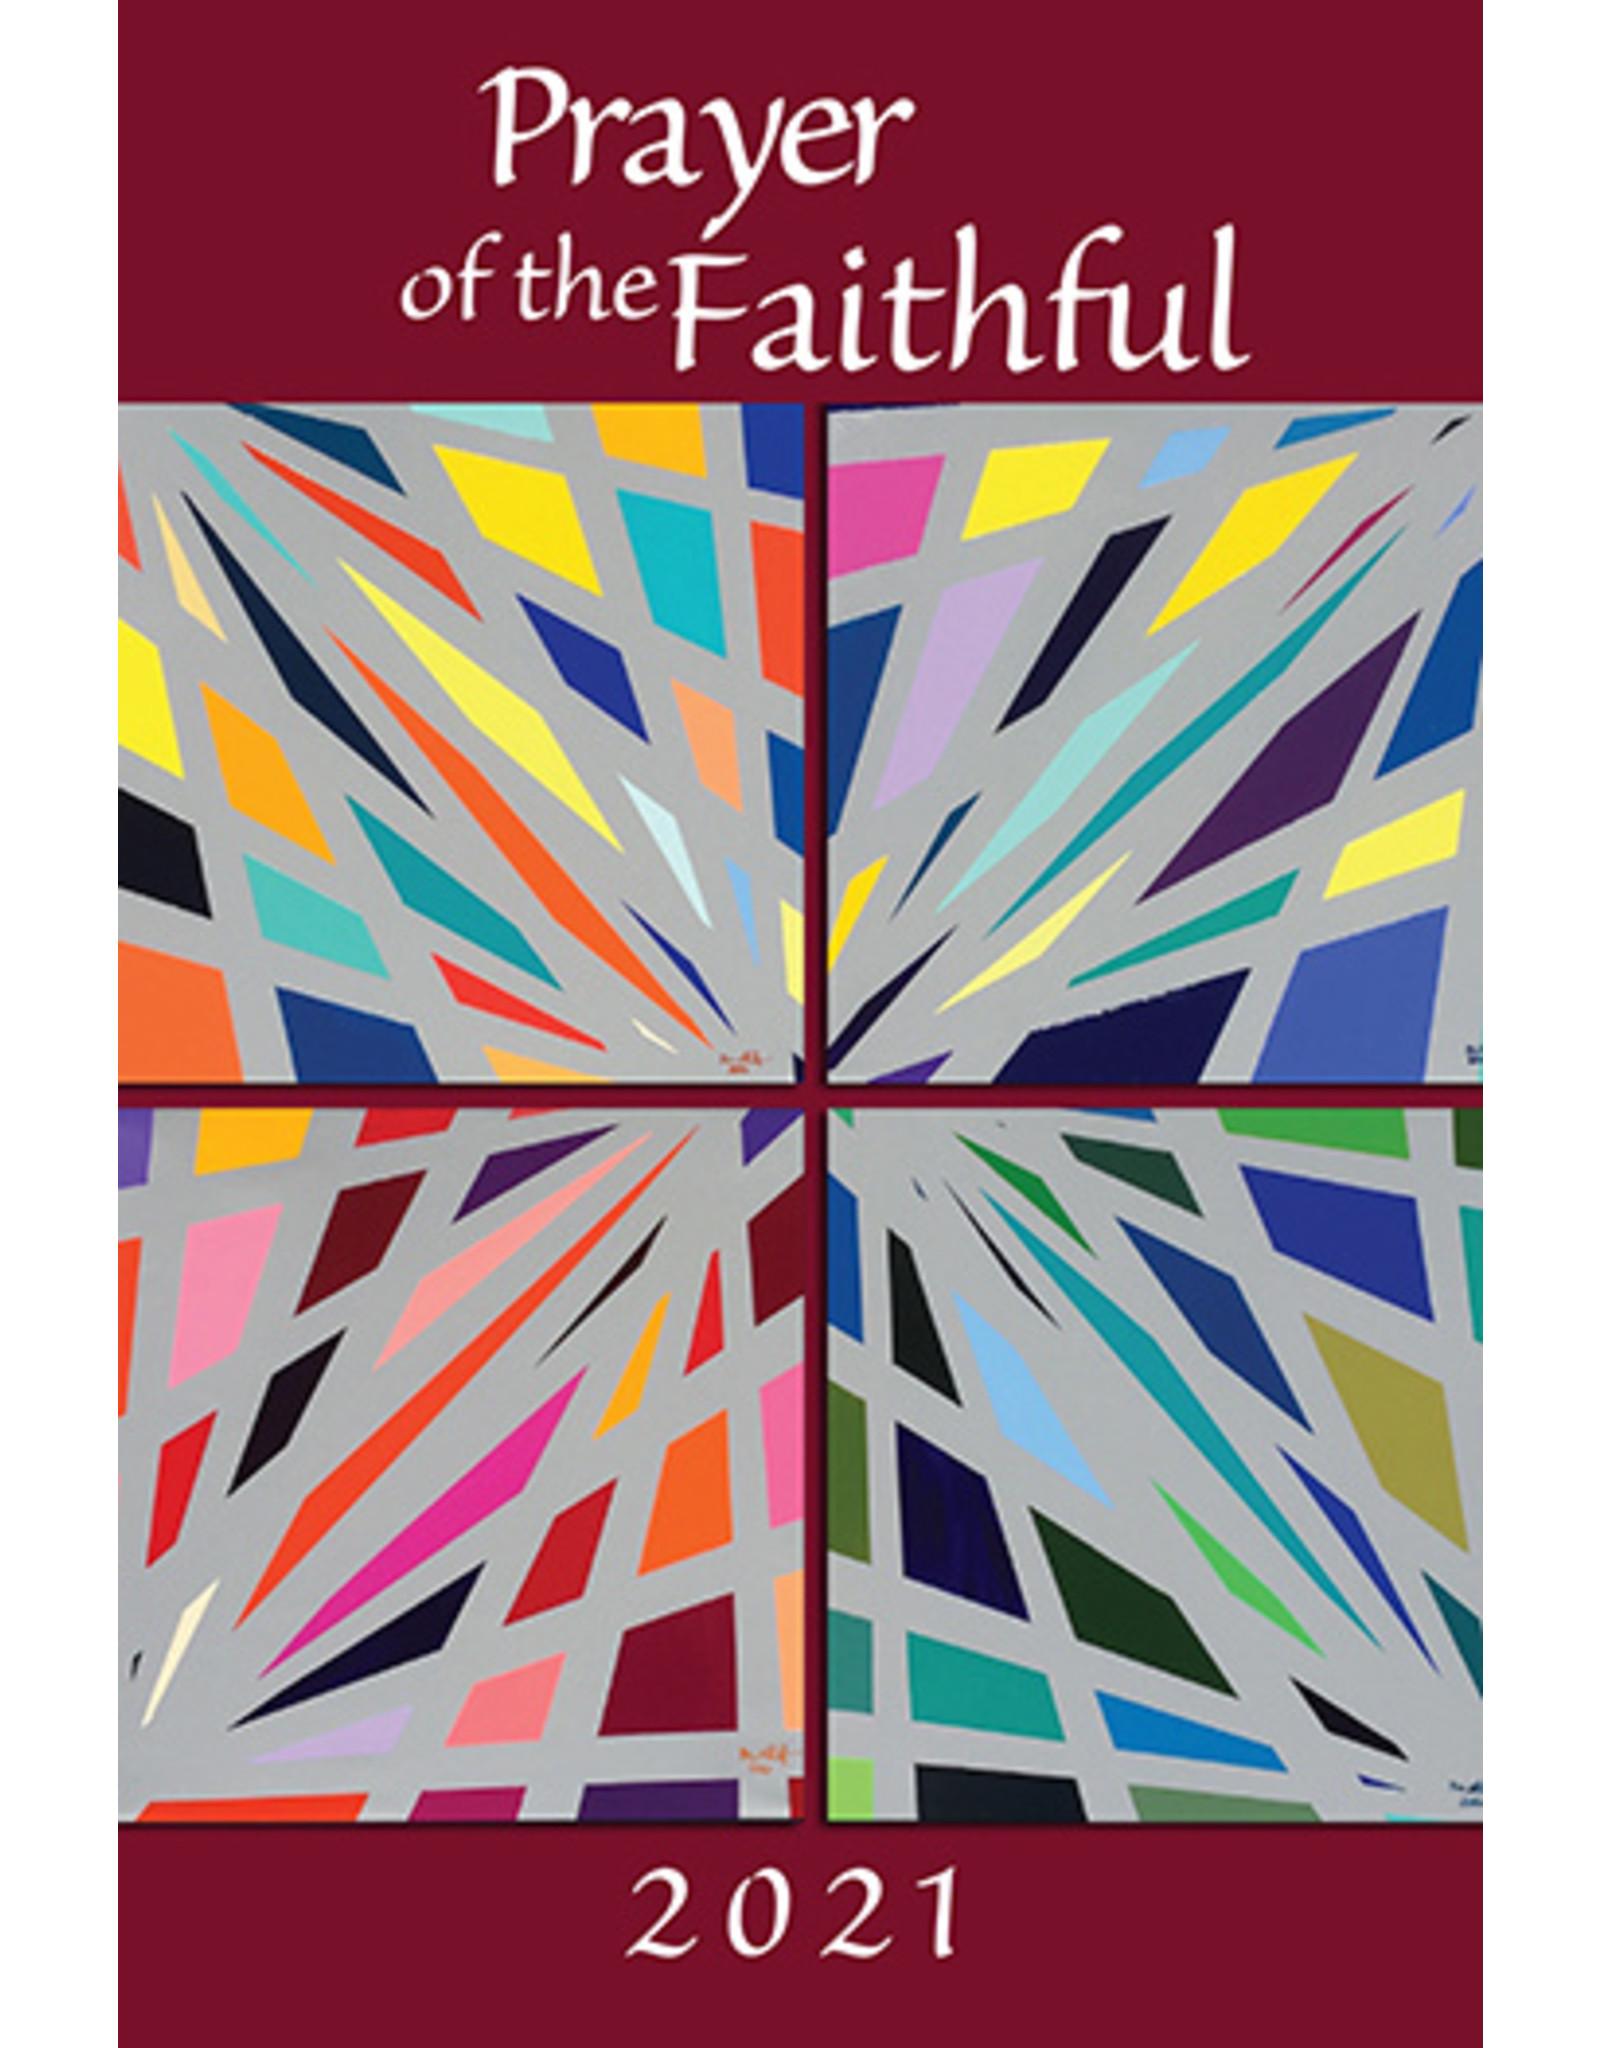 2021 PRAYER OF FAITHFUL